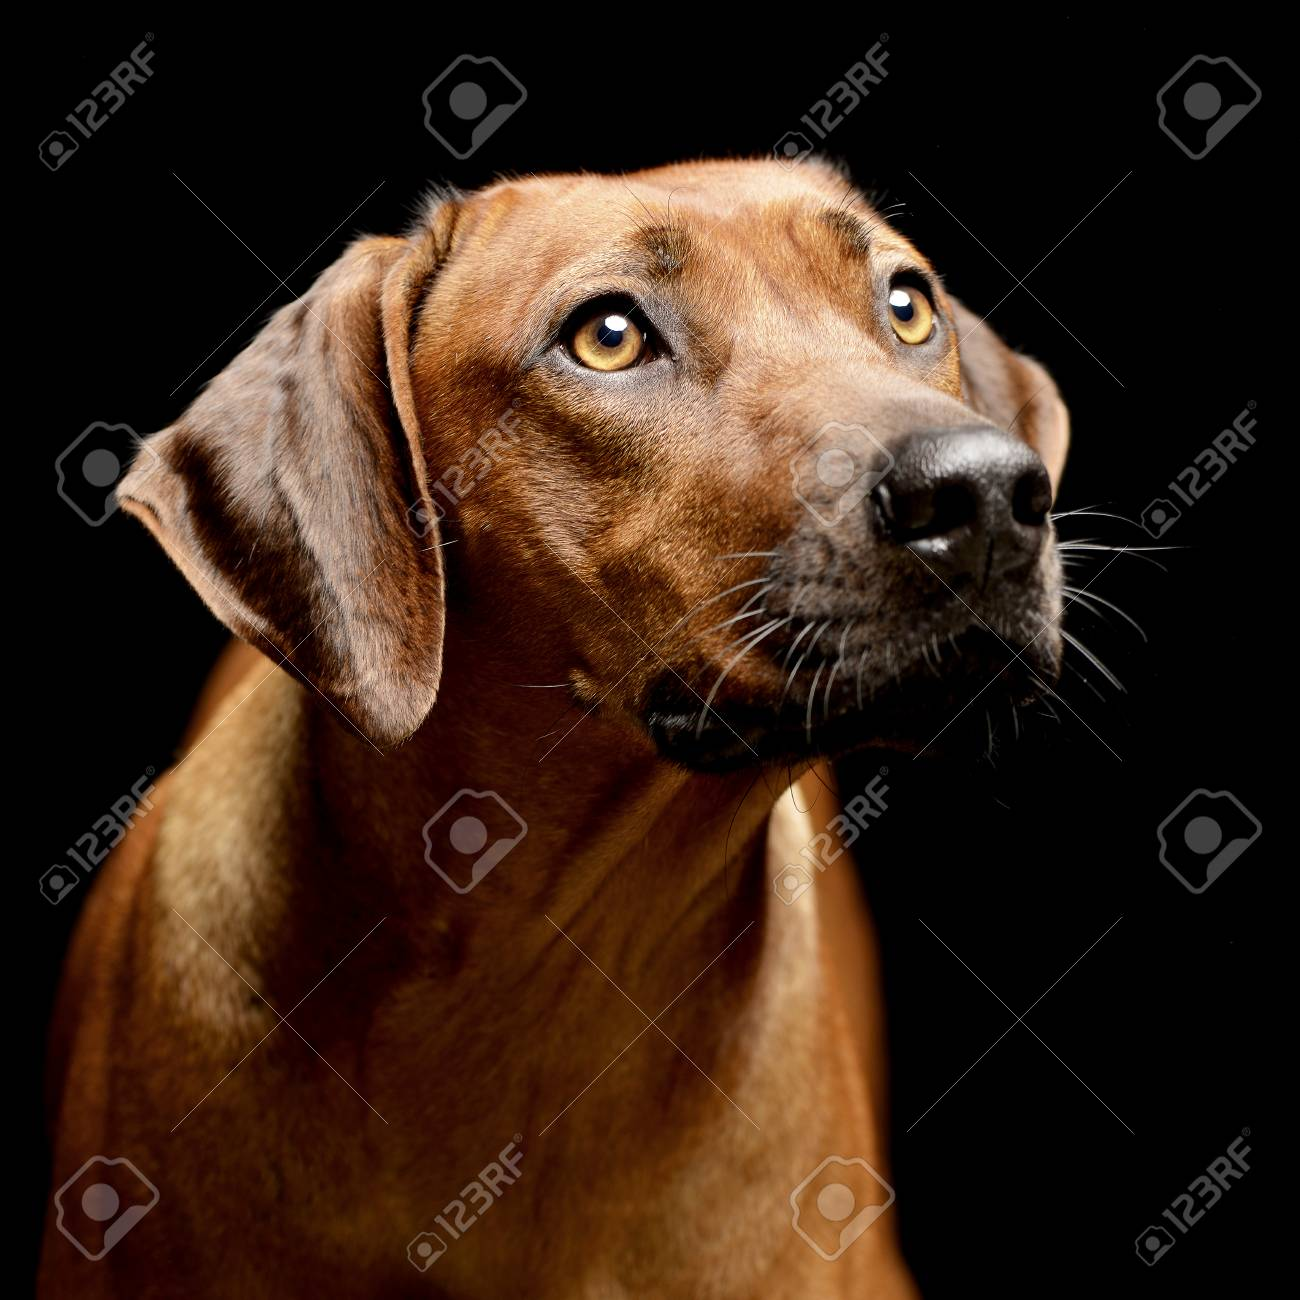 Top Rhodesian Ridgeback Brown Adorable Dog - 77689518-portrait-of-an-adorable-rhodesian-ridgeback-studio-shot-isolated-on-black-  2018_396660  .jpg